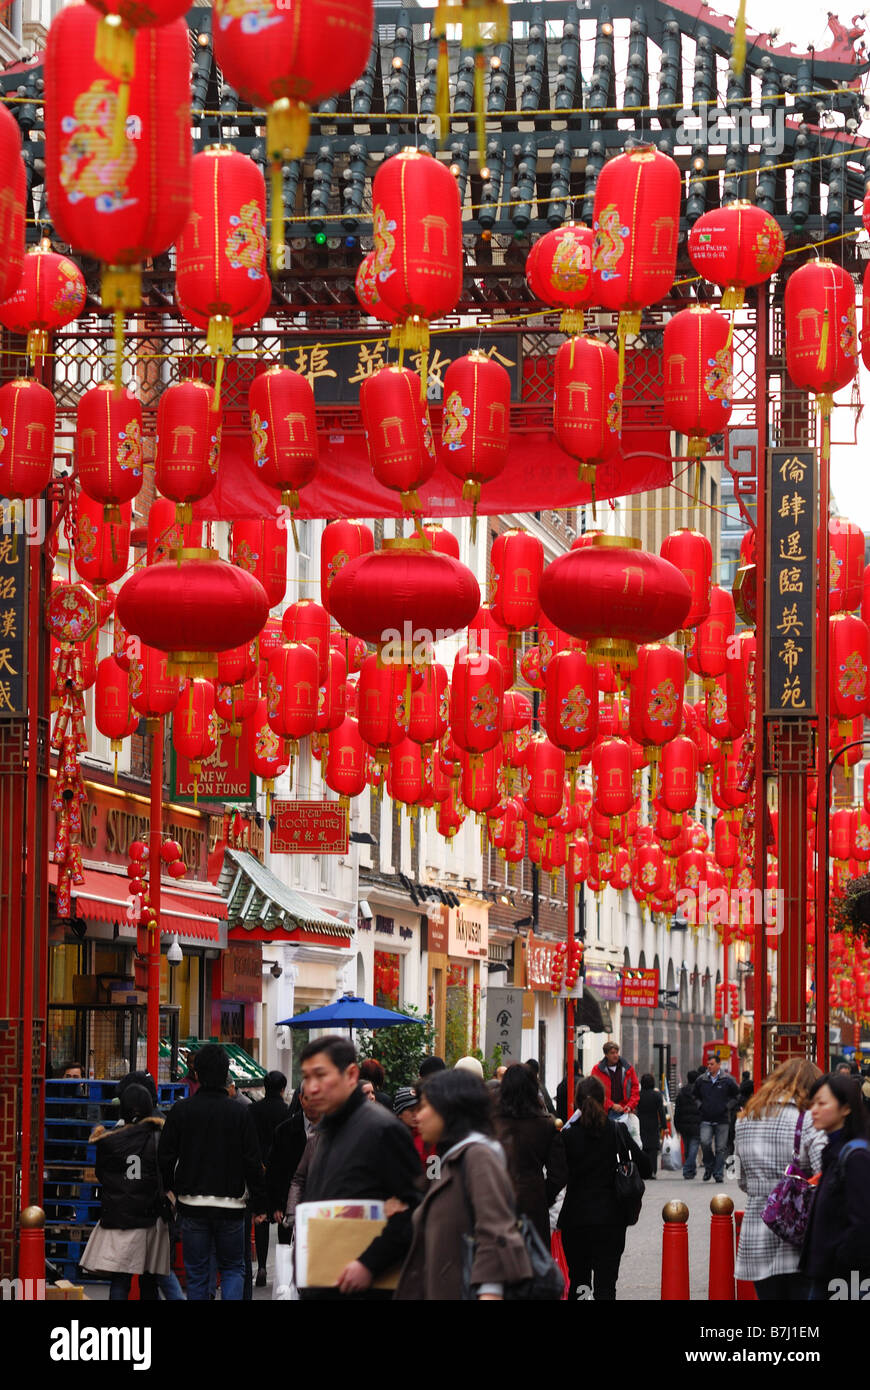 Chinese red lanterns in Gerrard Street London - Stock Image